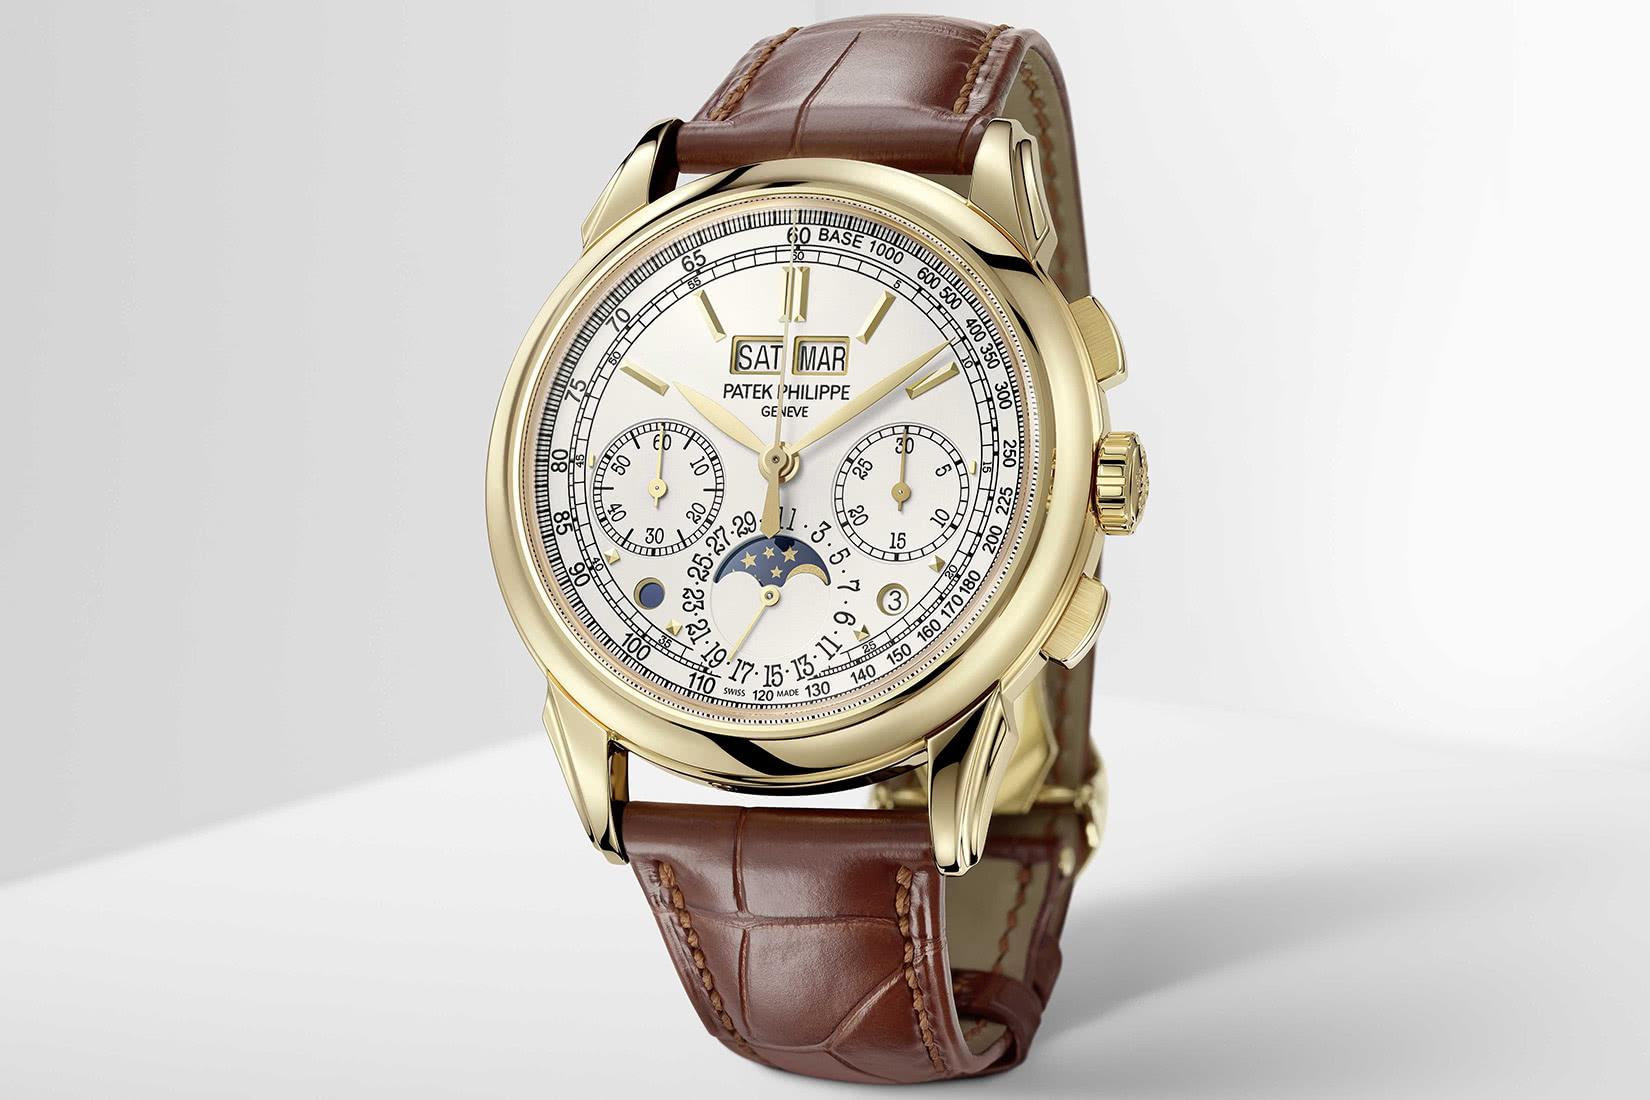 watch complications - Luxe Digital